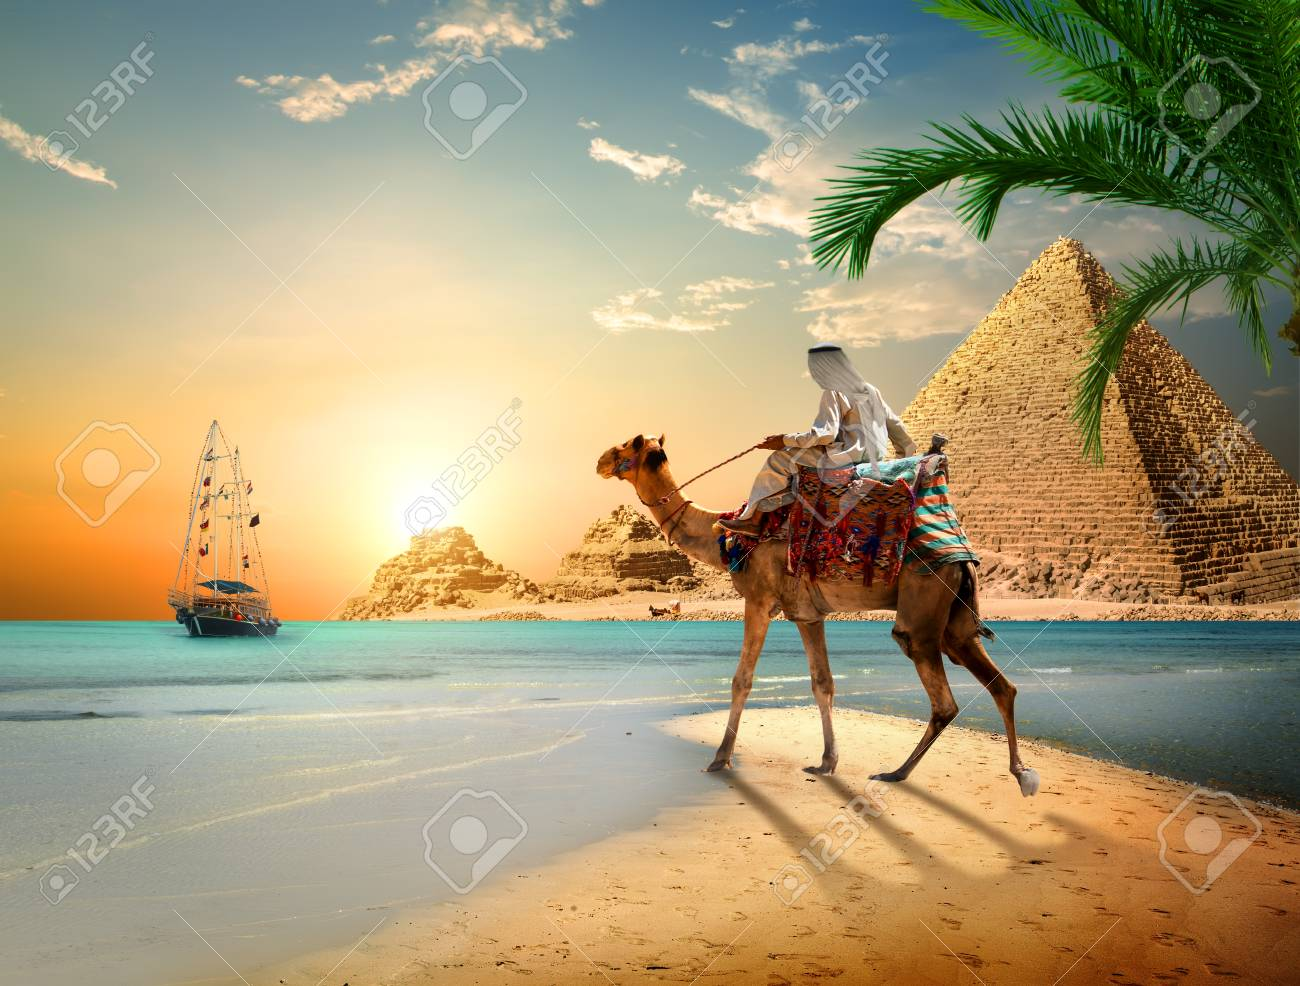 Sea and Pyramids - 110766973